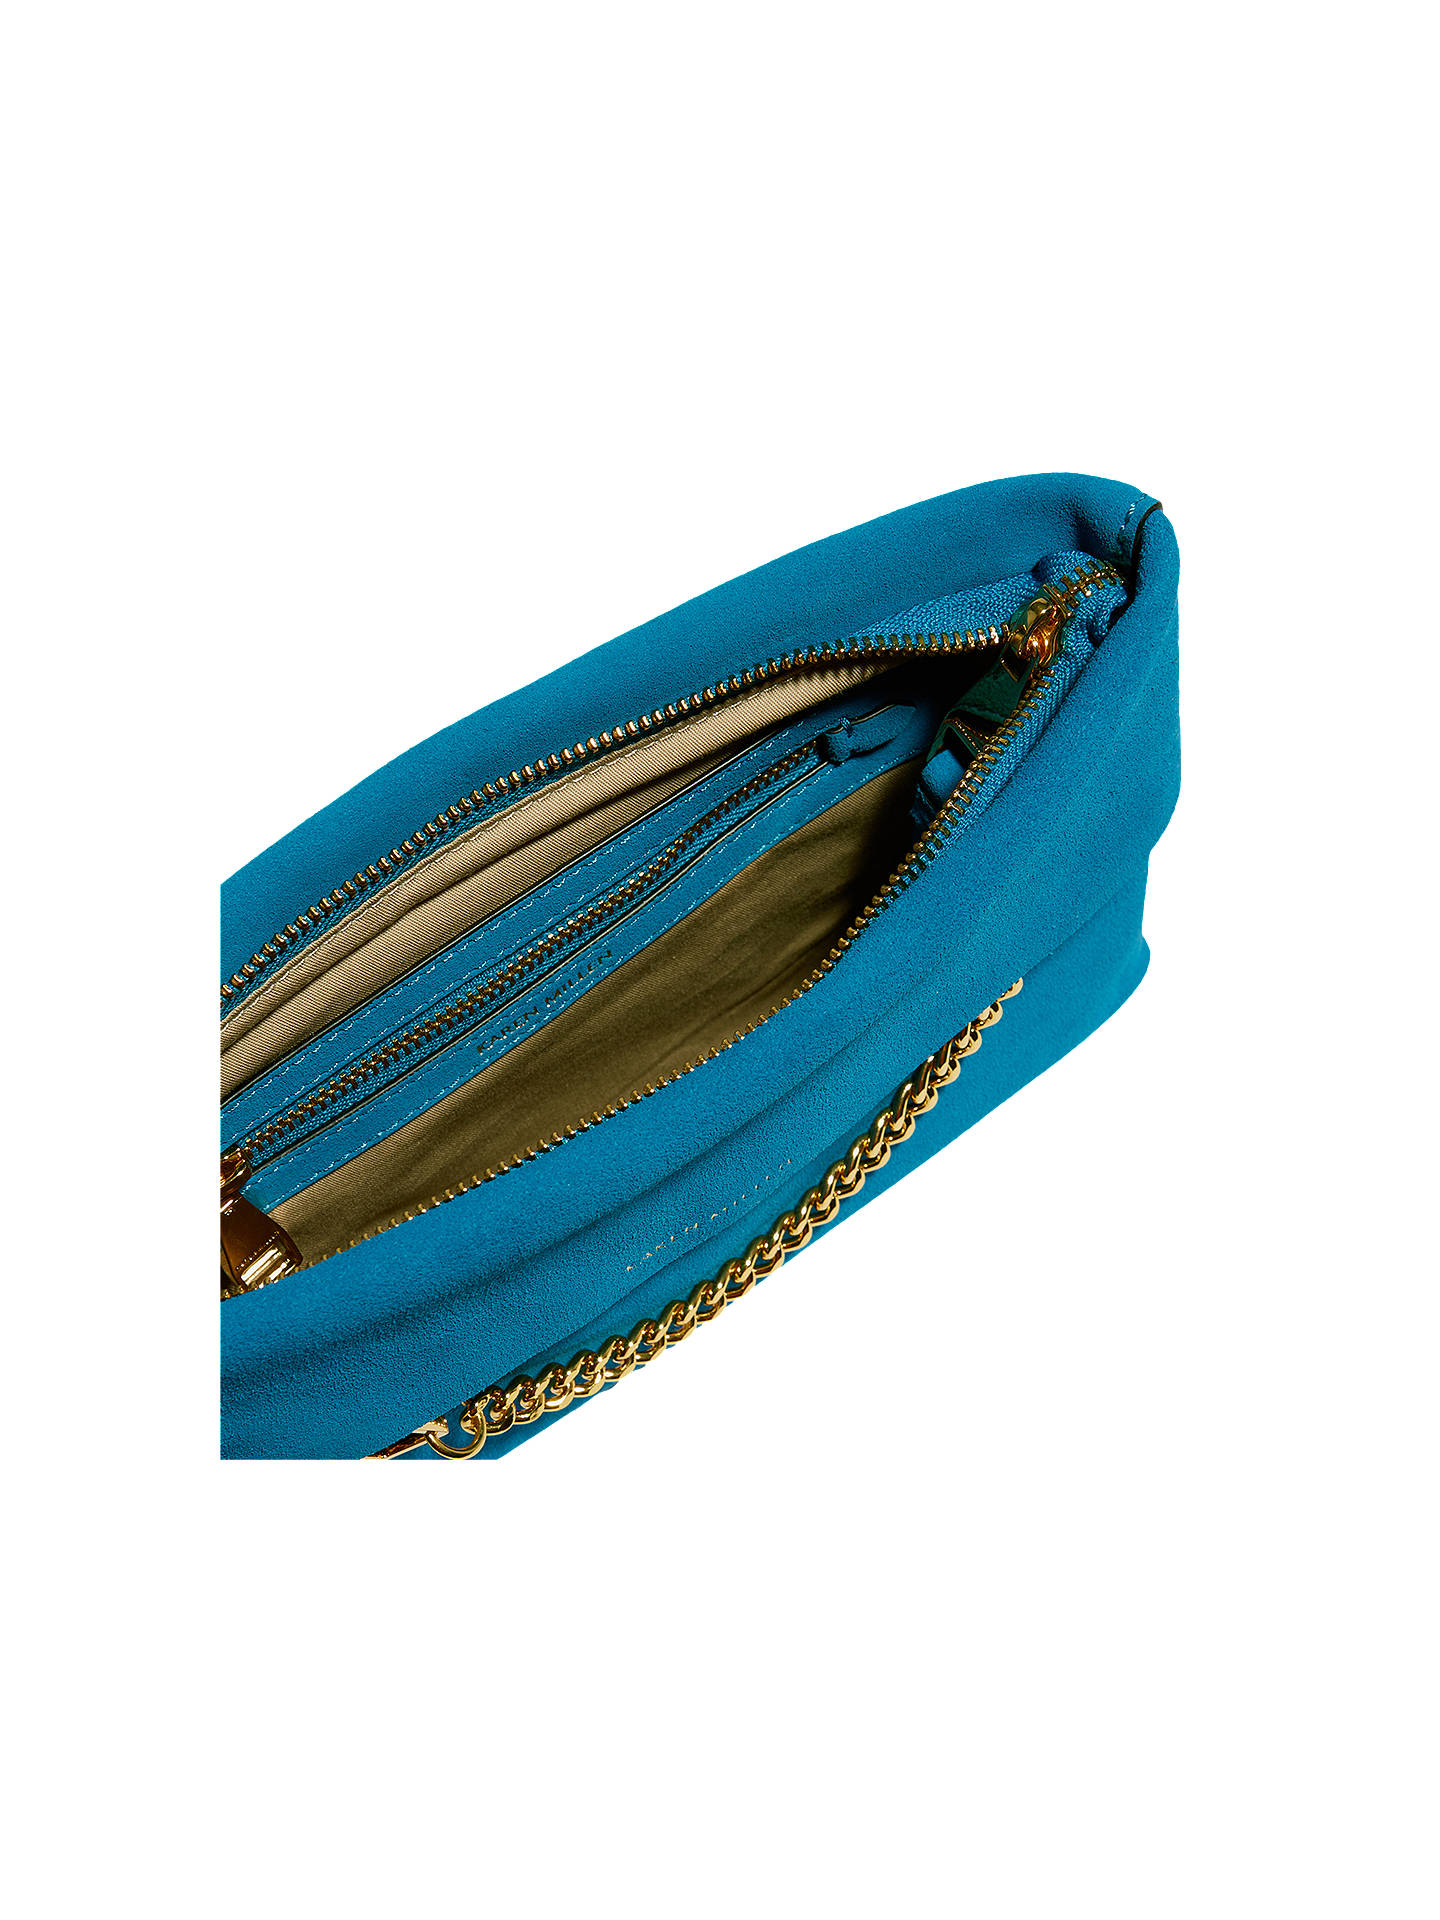 ff14afcec9ef ... Buy Karen Millen Leather Chain Zip Clutch Bag, Blue Suede Online at  johnlewis.com ...